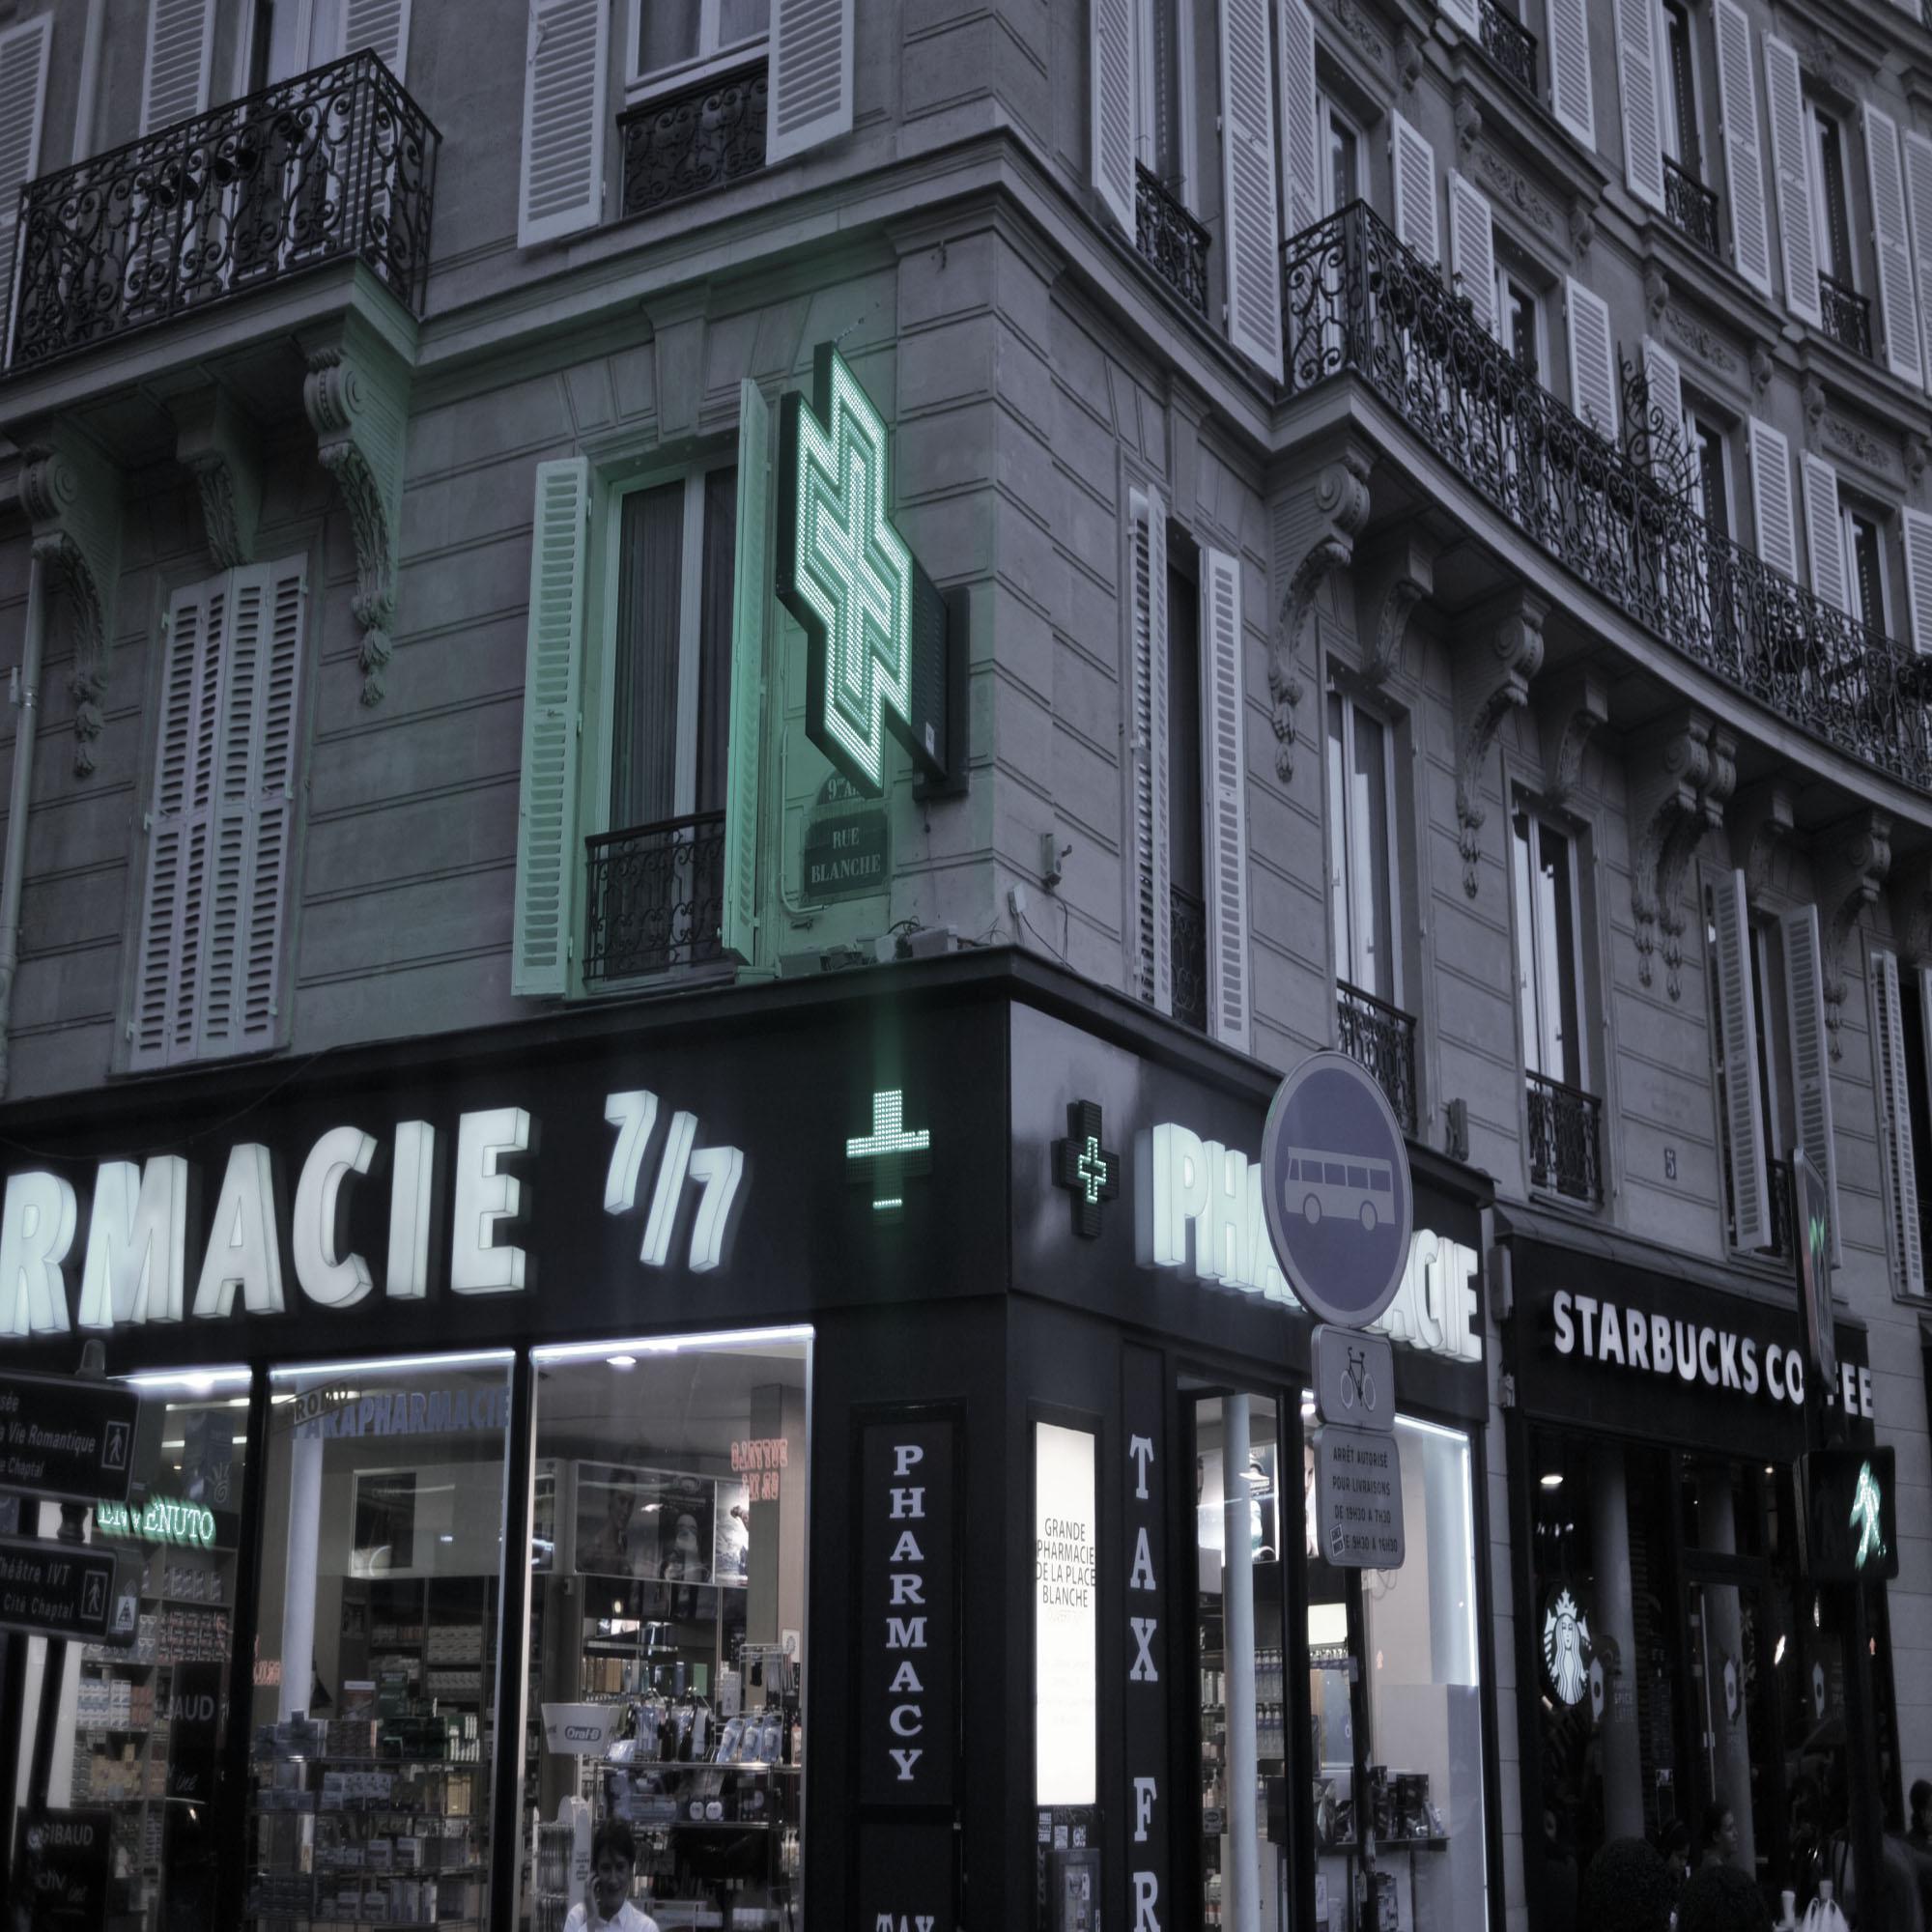 pharmacieplaceblanchesq.jpg